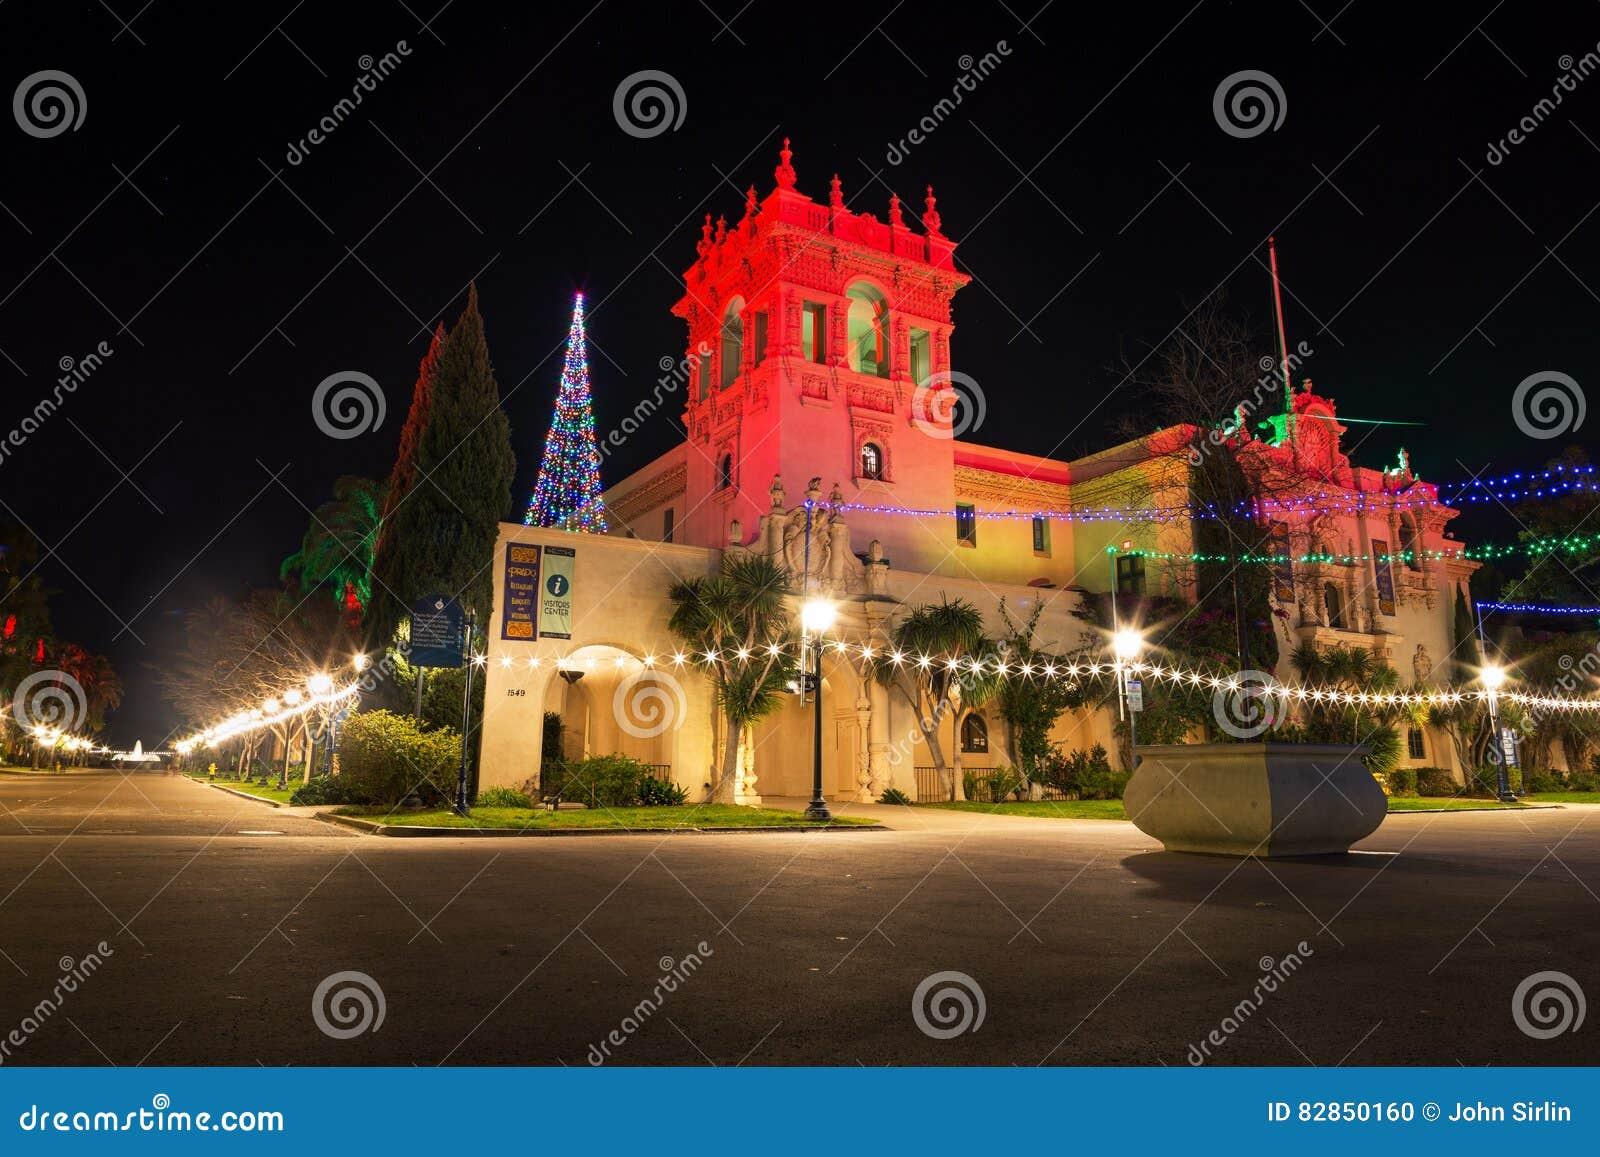 San Diego Christmas Lights.Christmas Lights In Balboa Park Editorial Image Image Of